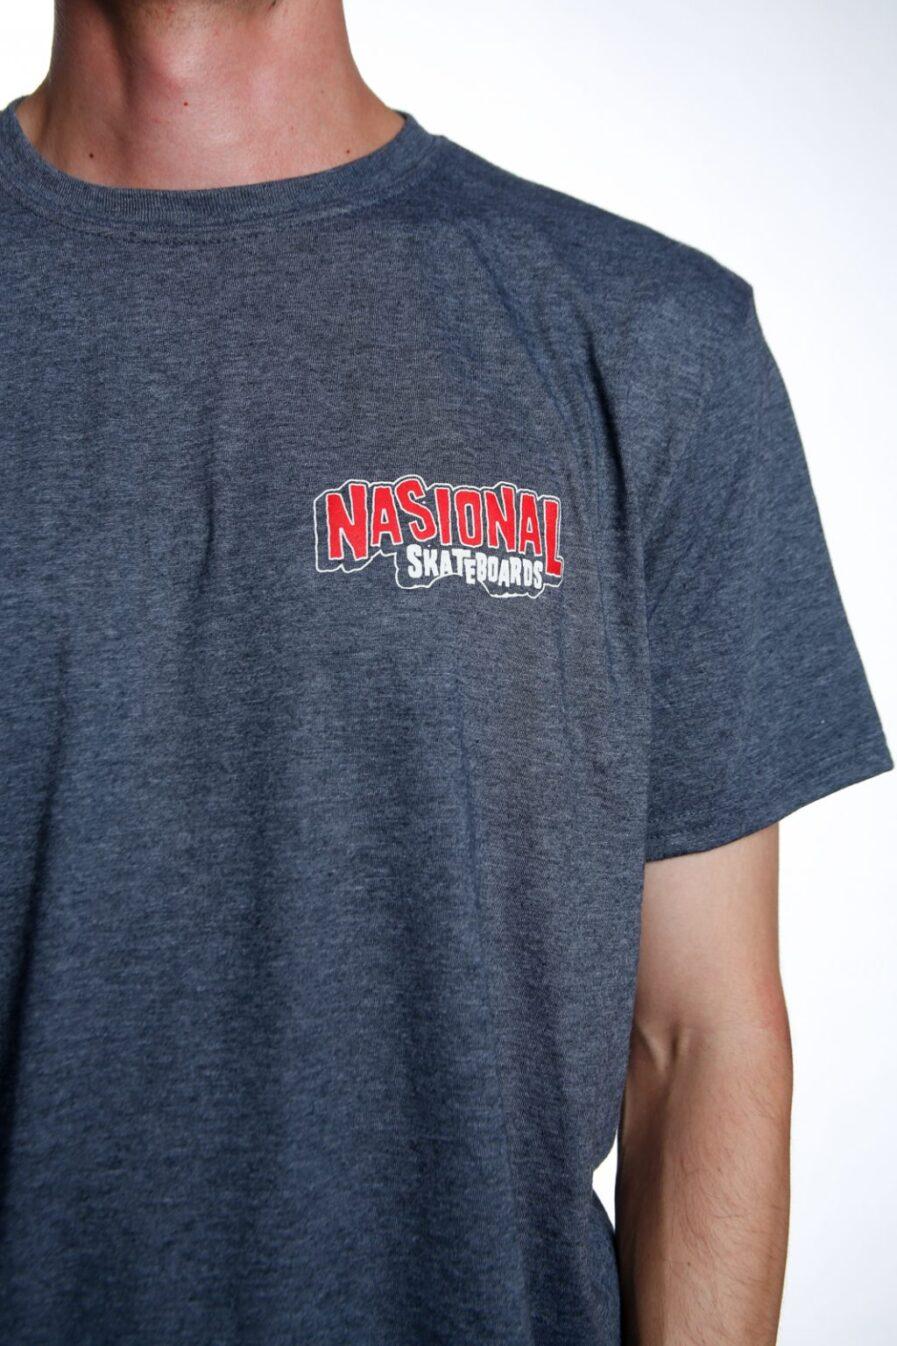 camiseta nasional skateboards